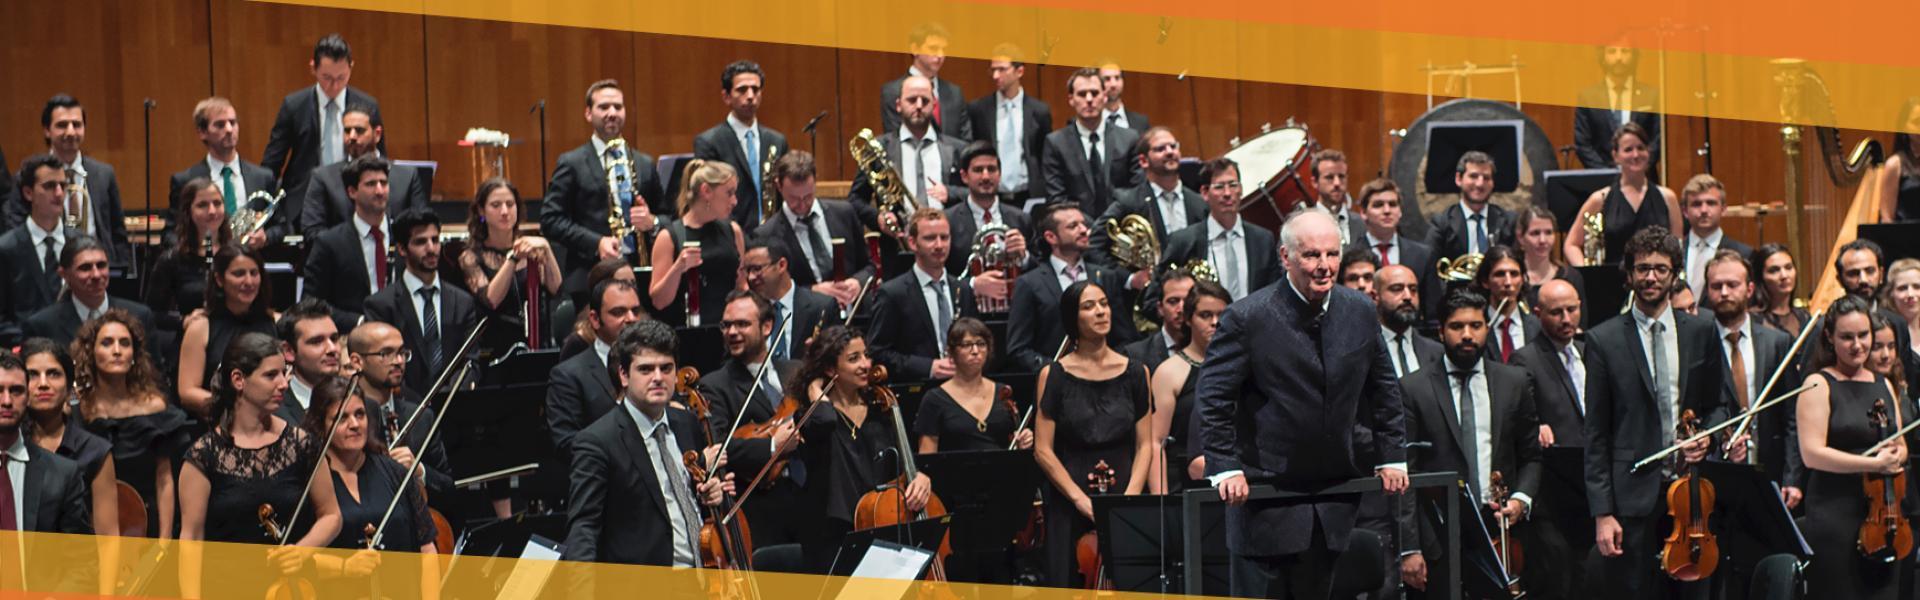 Livestream: Beethoven Jubilee Concert